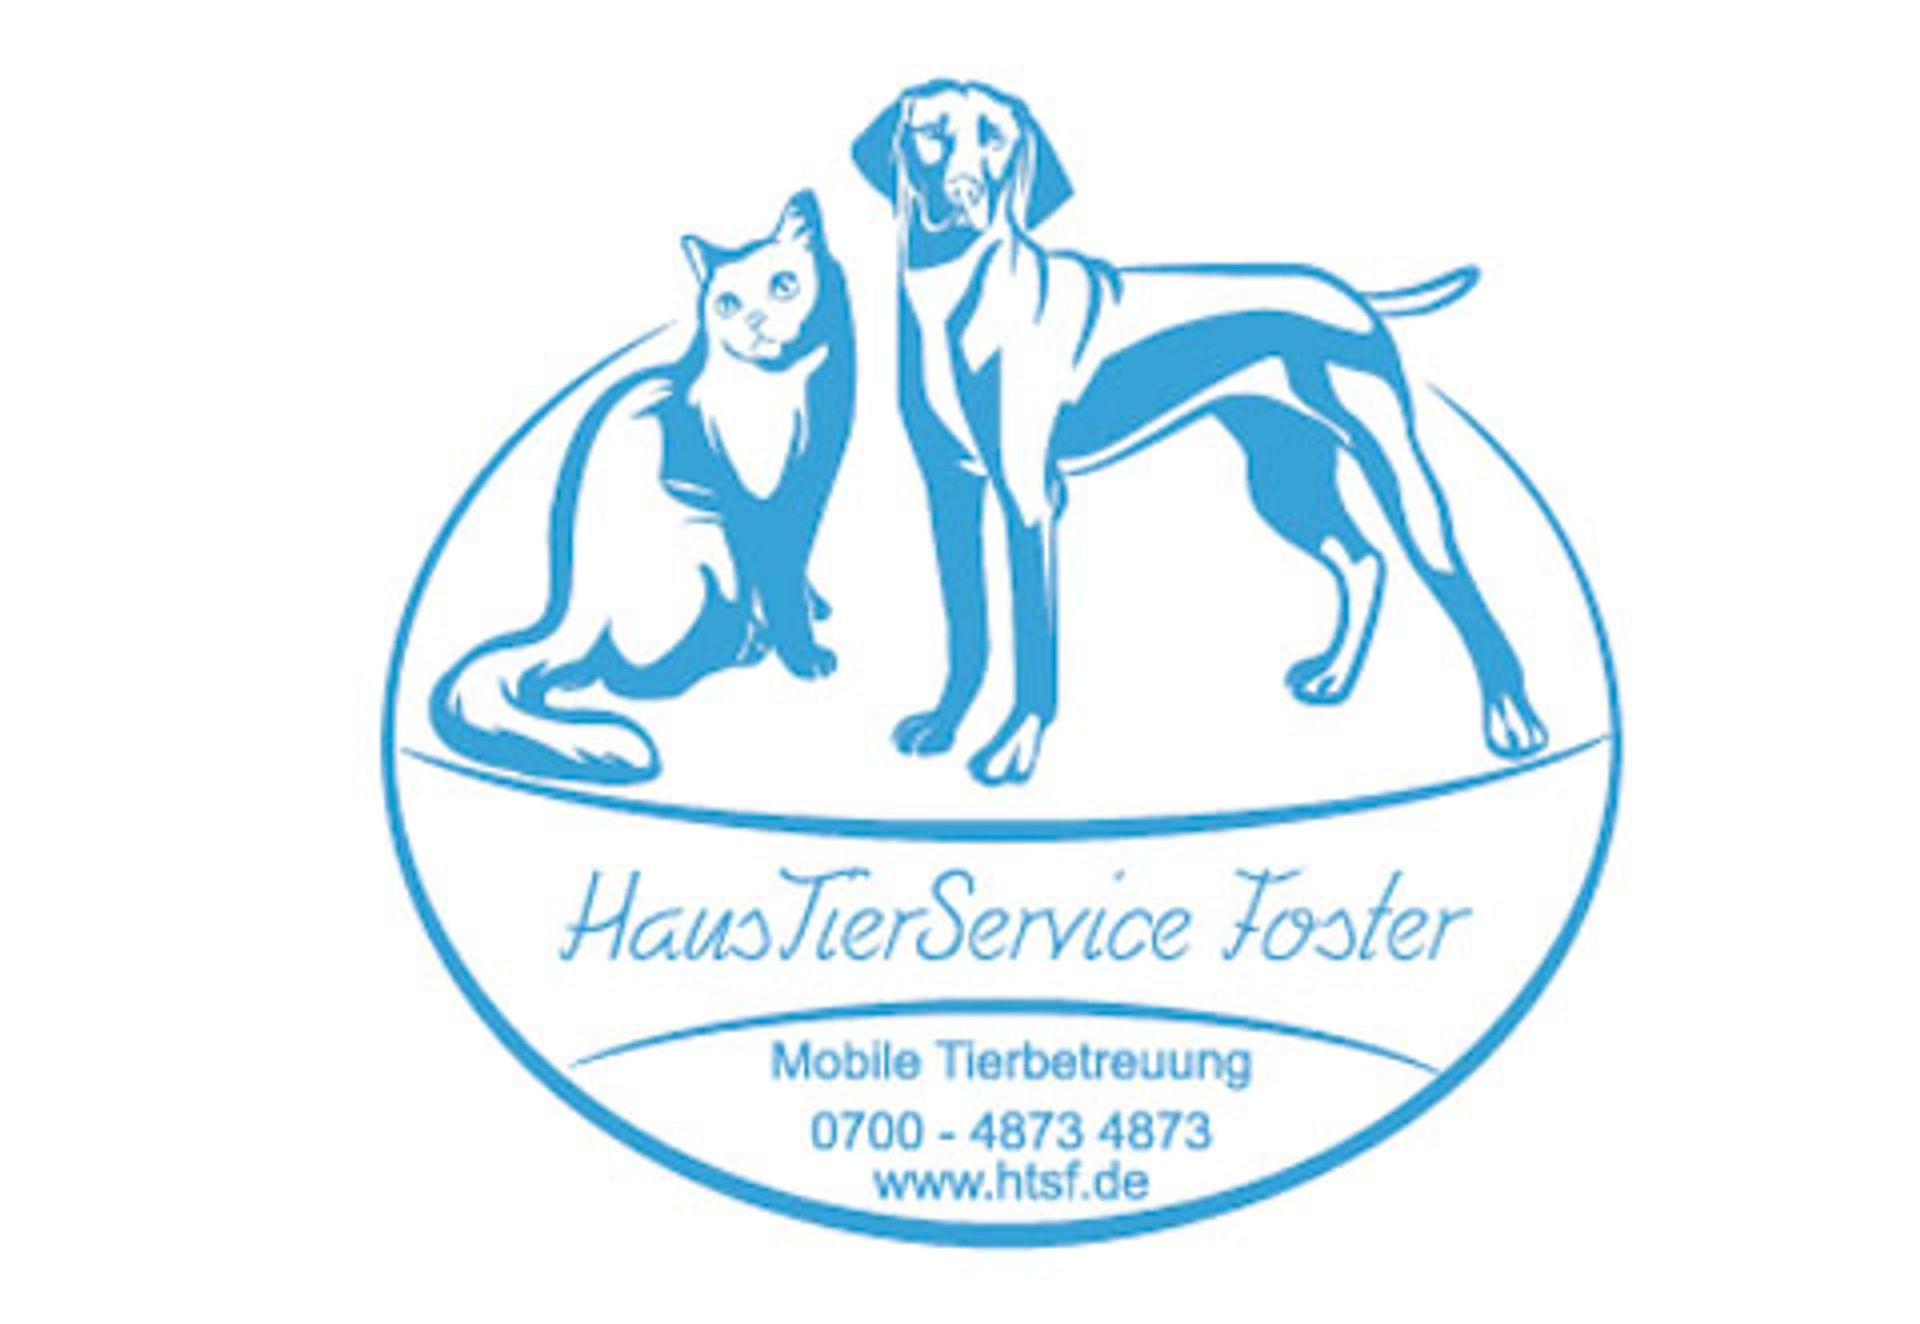 HausTierService Foster